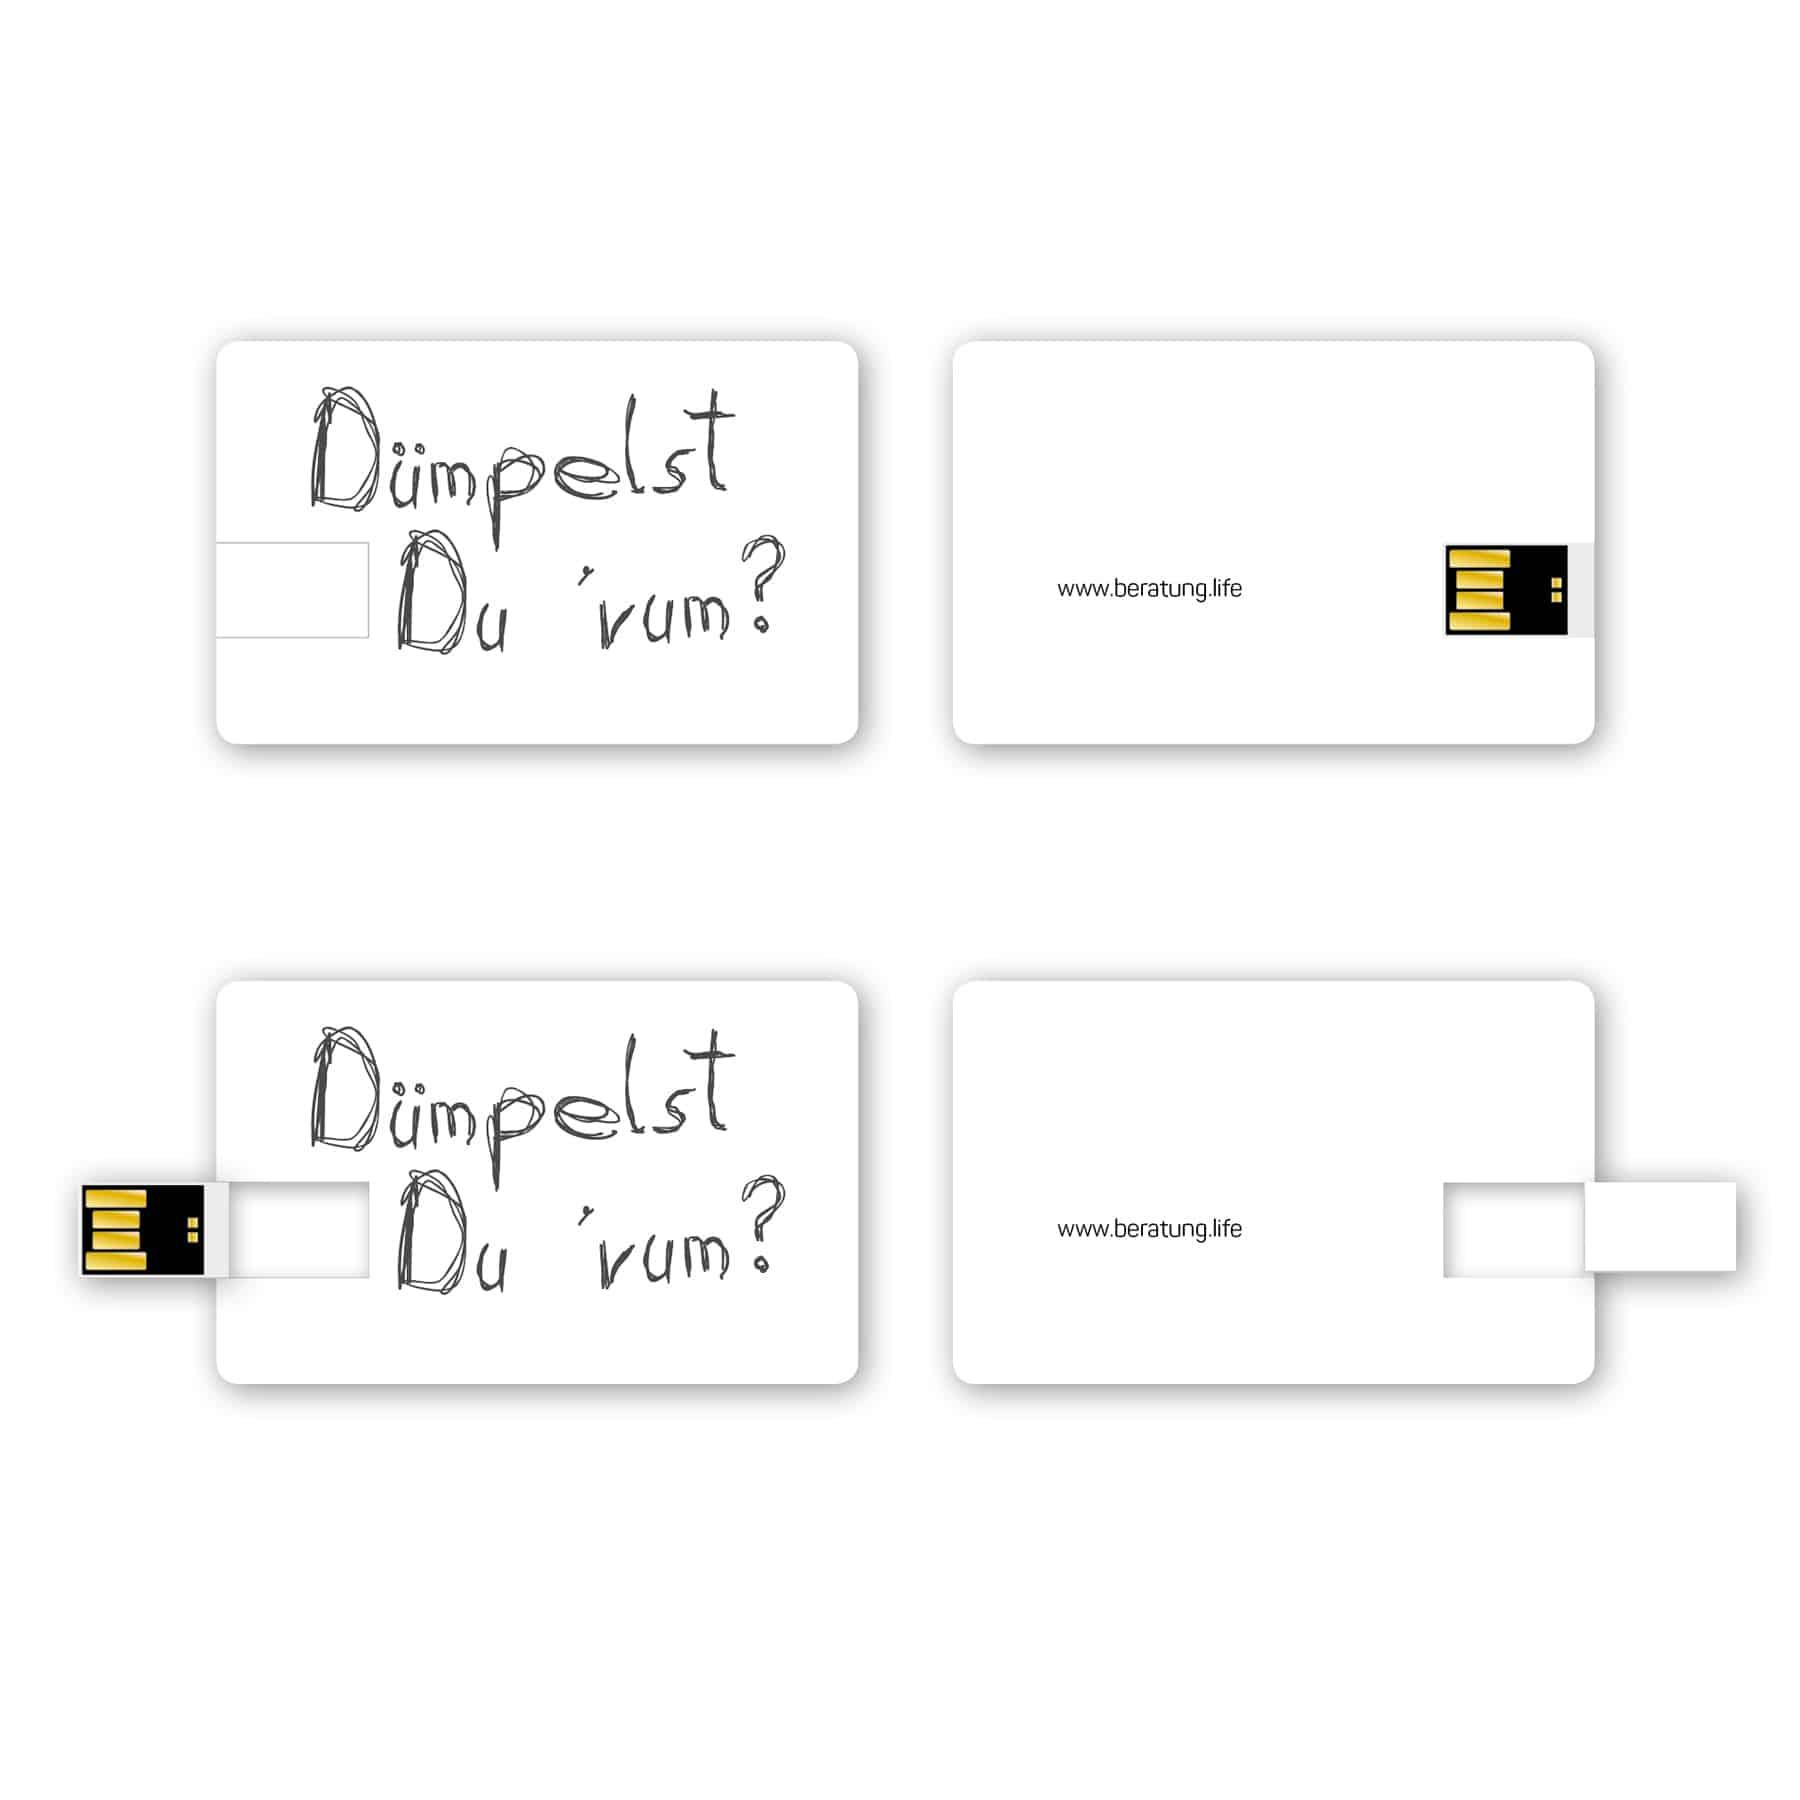 La Deutsche Vita - Drucksachen USB-Stick